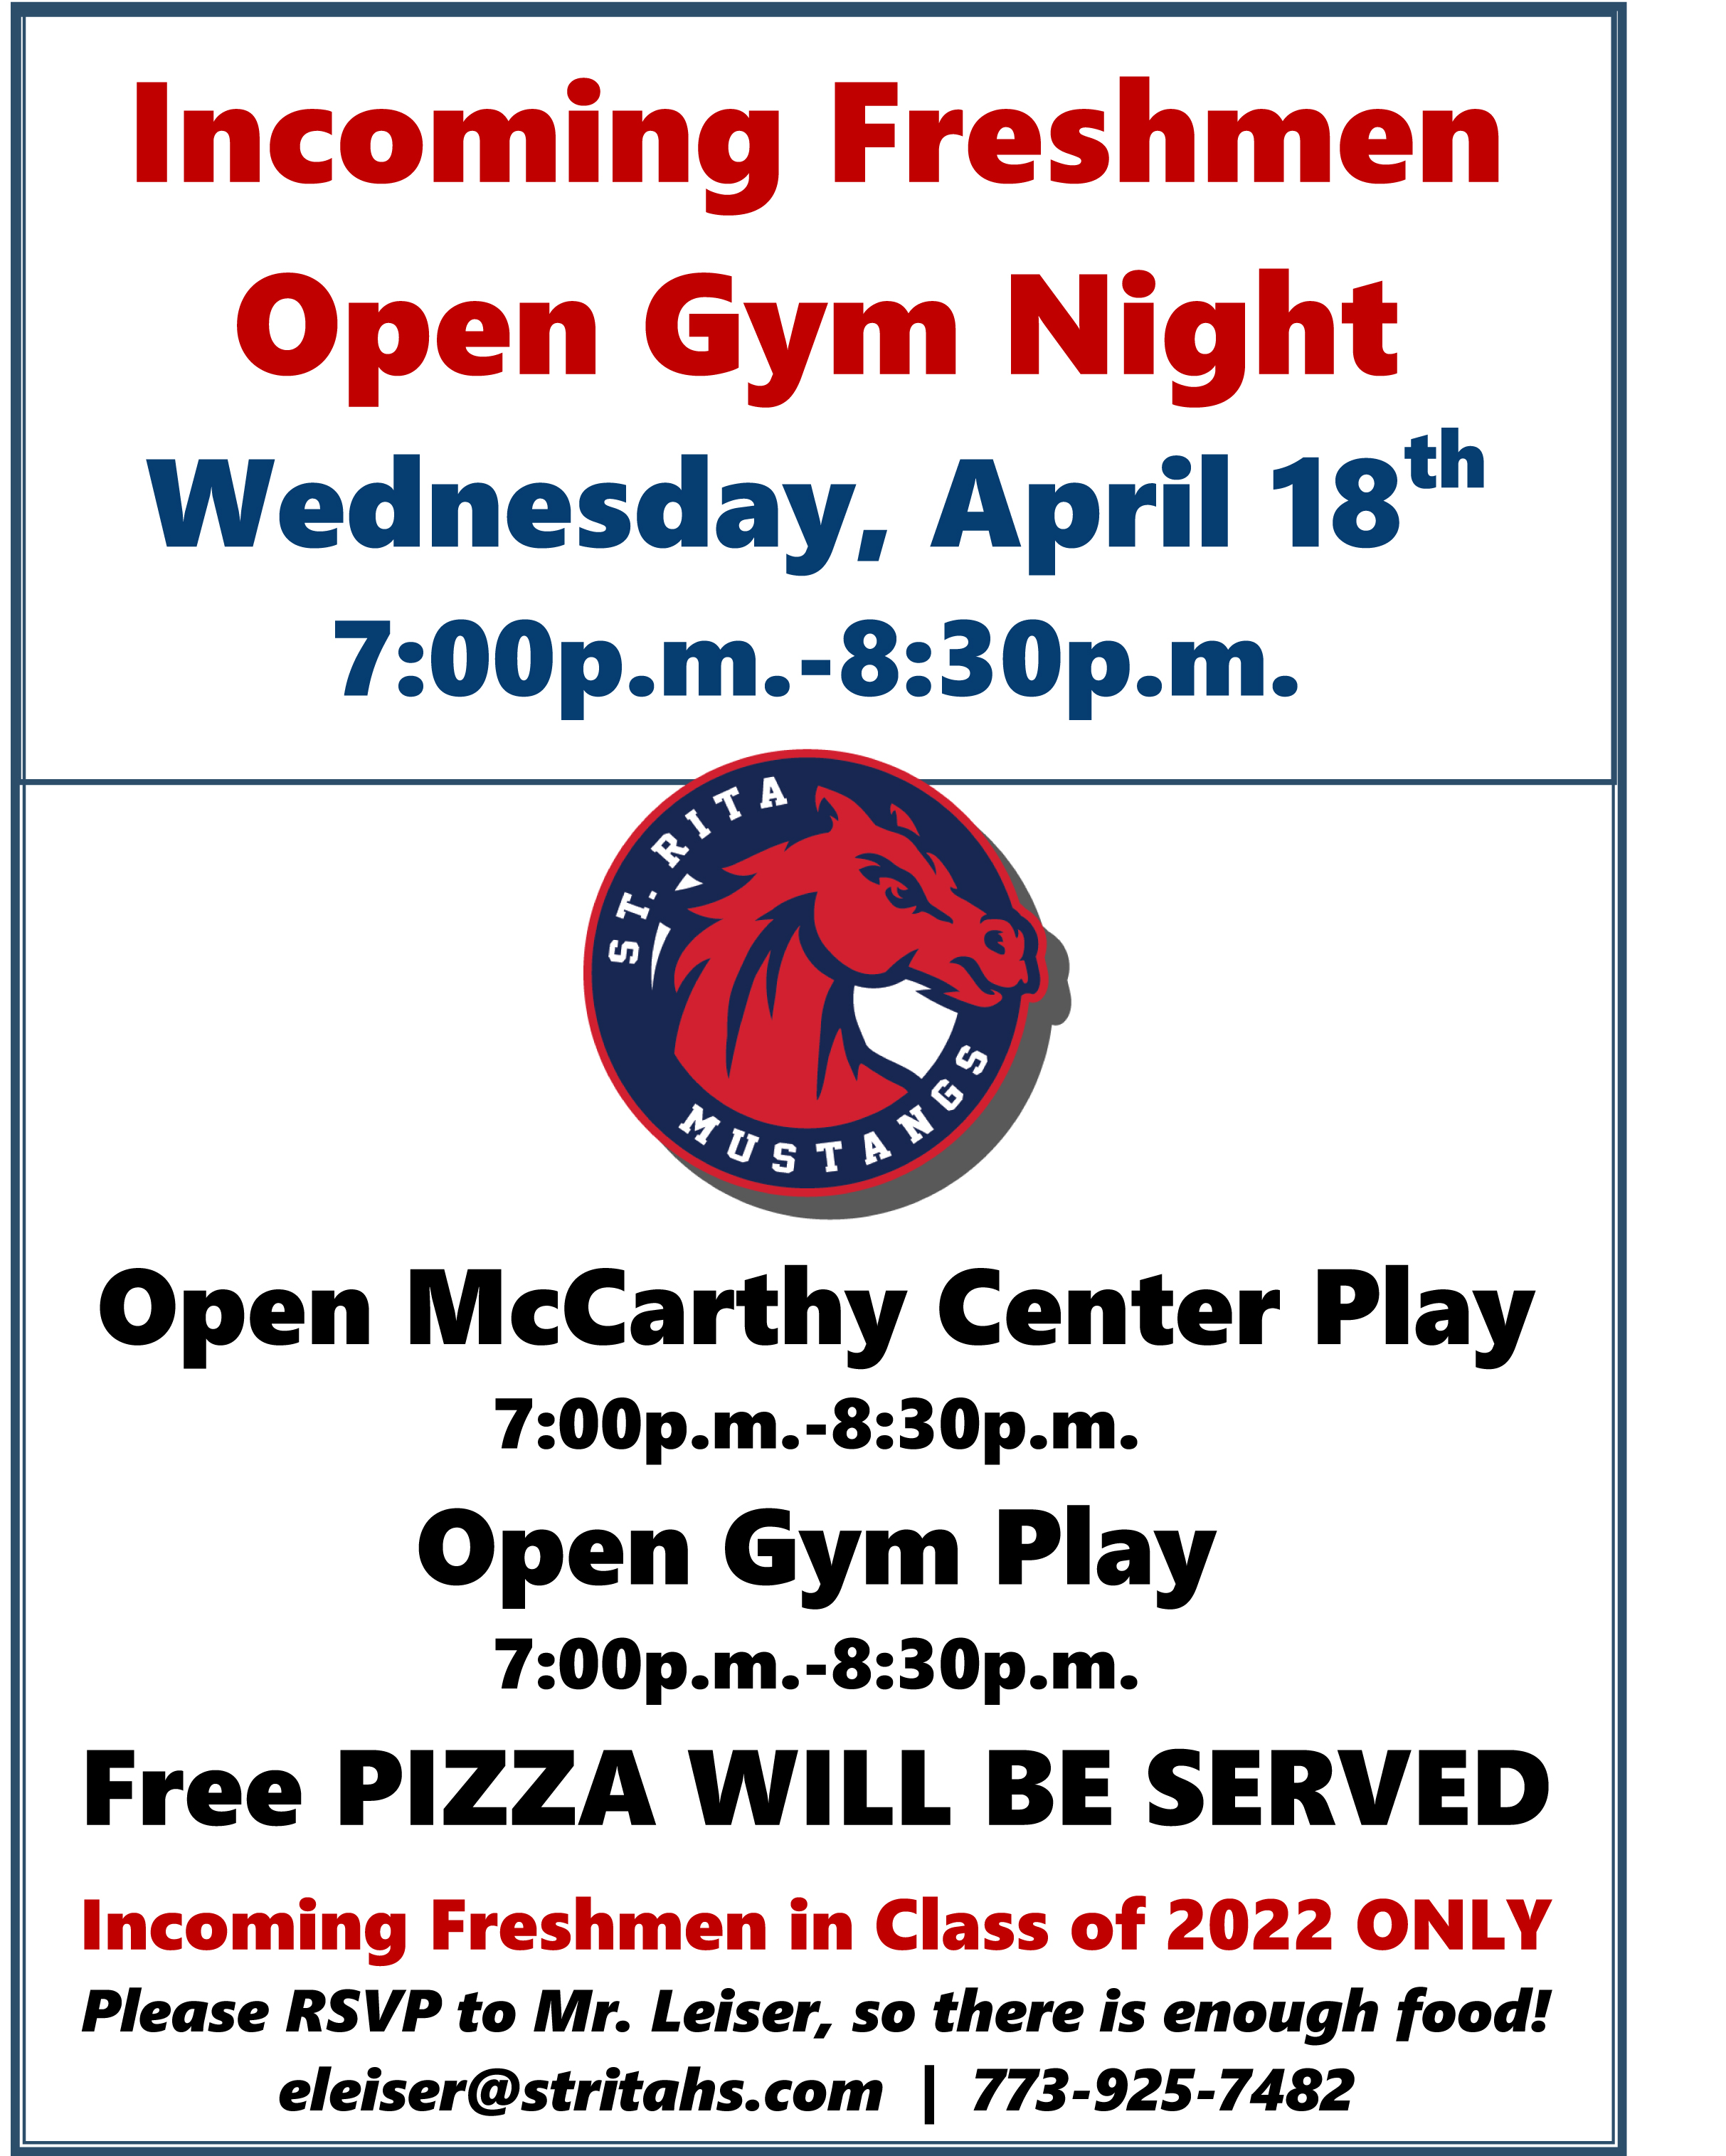 open gym pizza night class of 2022.jpg